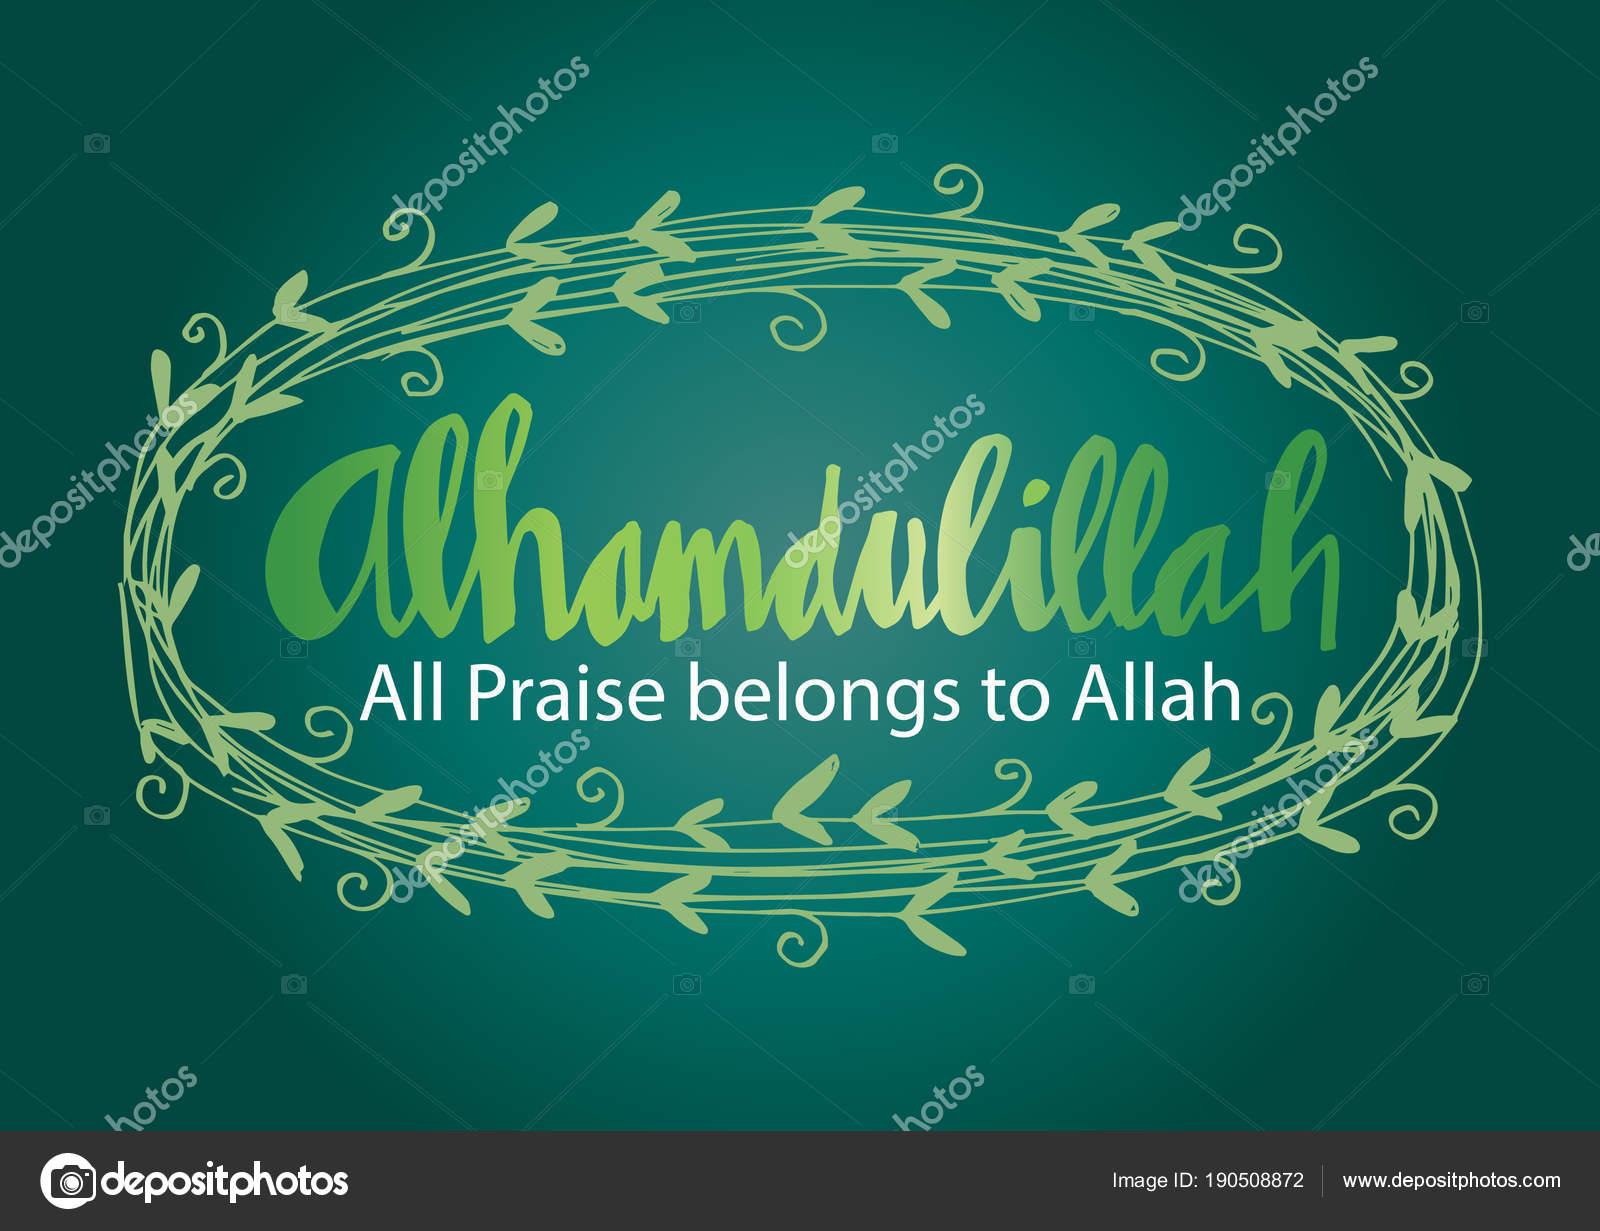 Alhamdulillah praise belongs allah hand lettering stock photo alhamdulillah praise belongs to allah hand lettering photo by handini altavistaventures Gallery